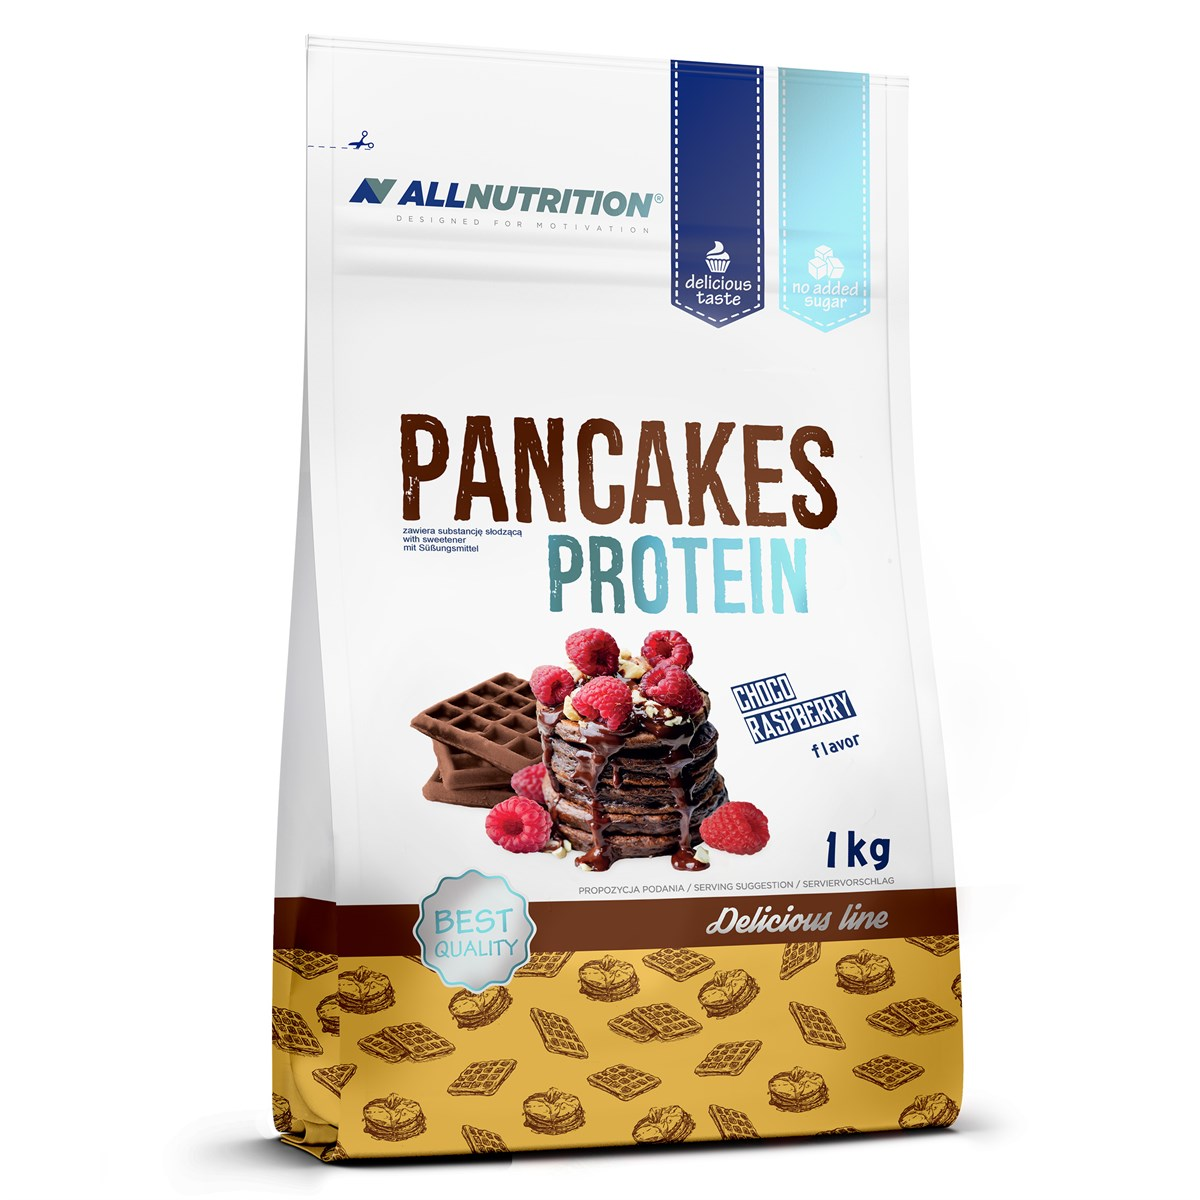 Allnutrition Pancakes